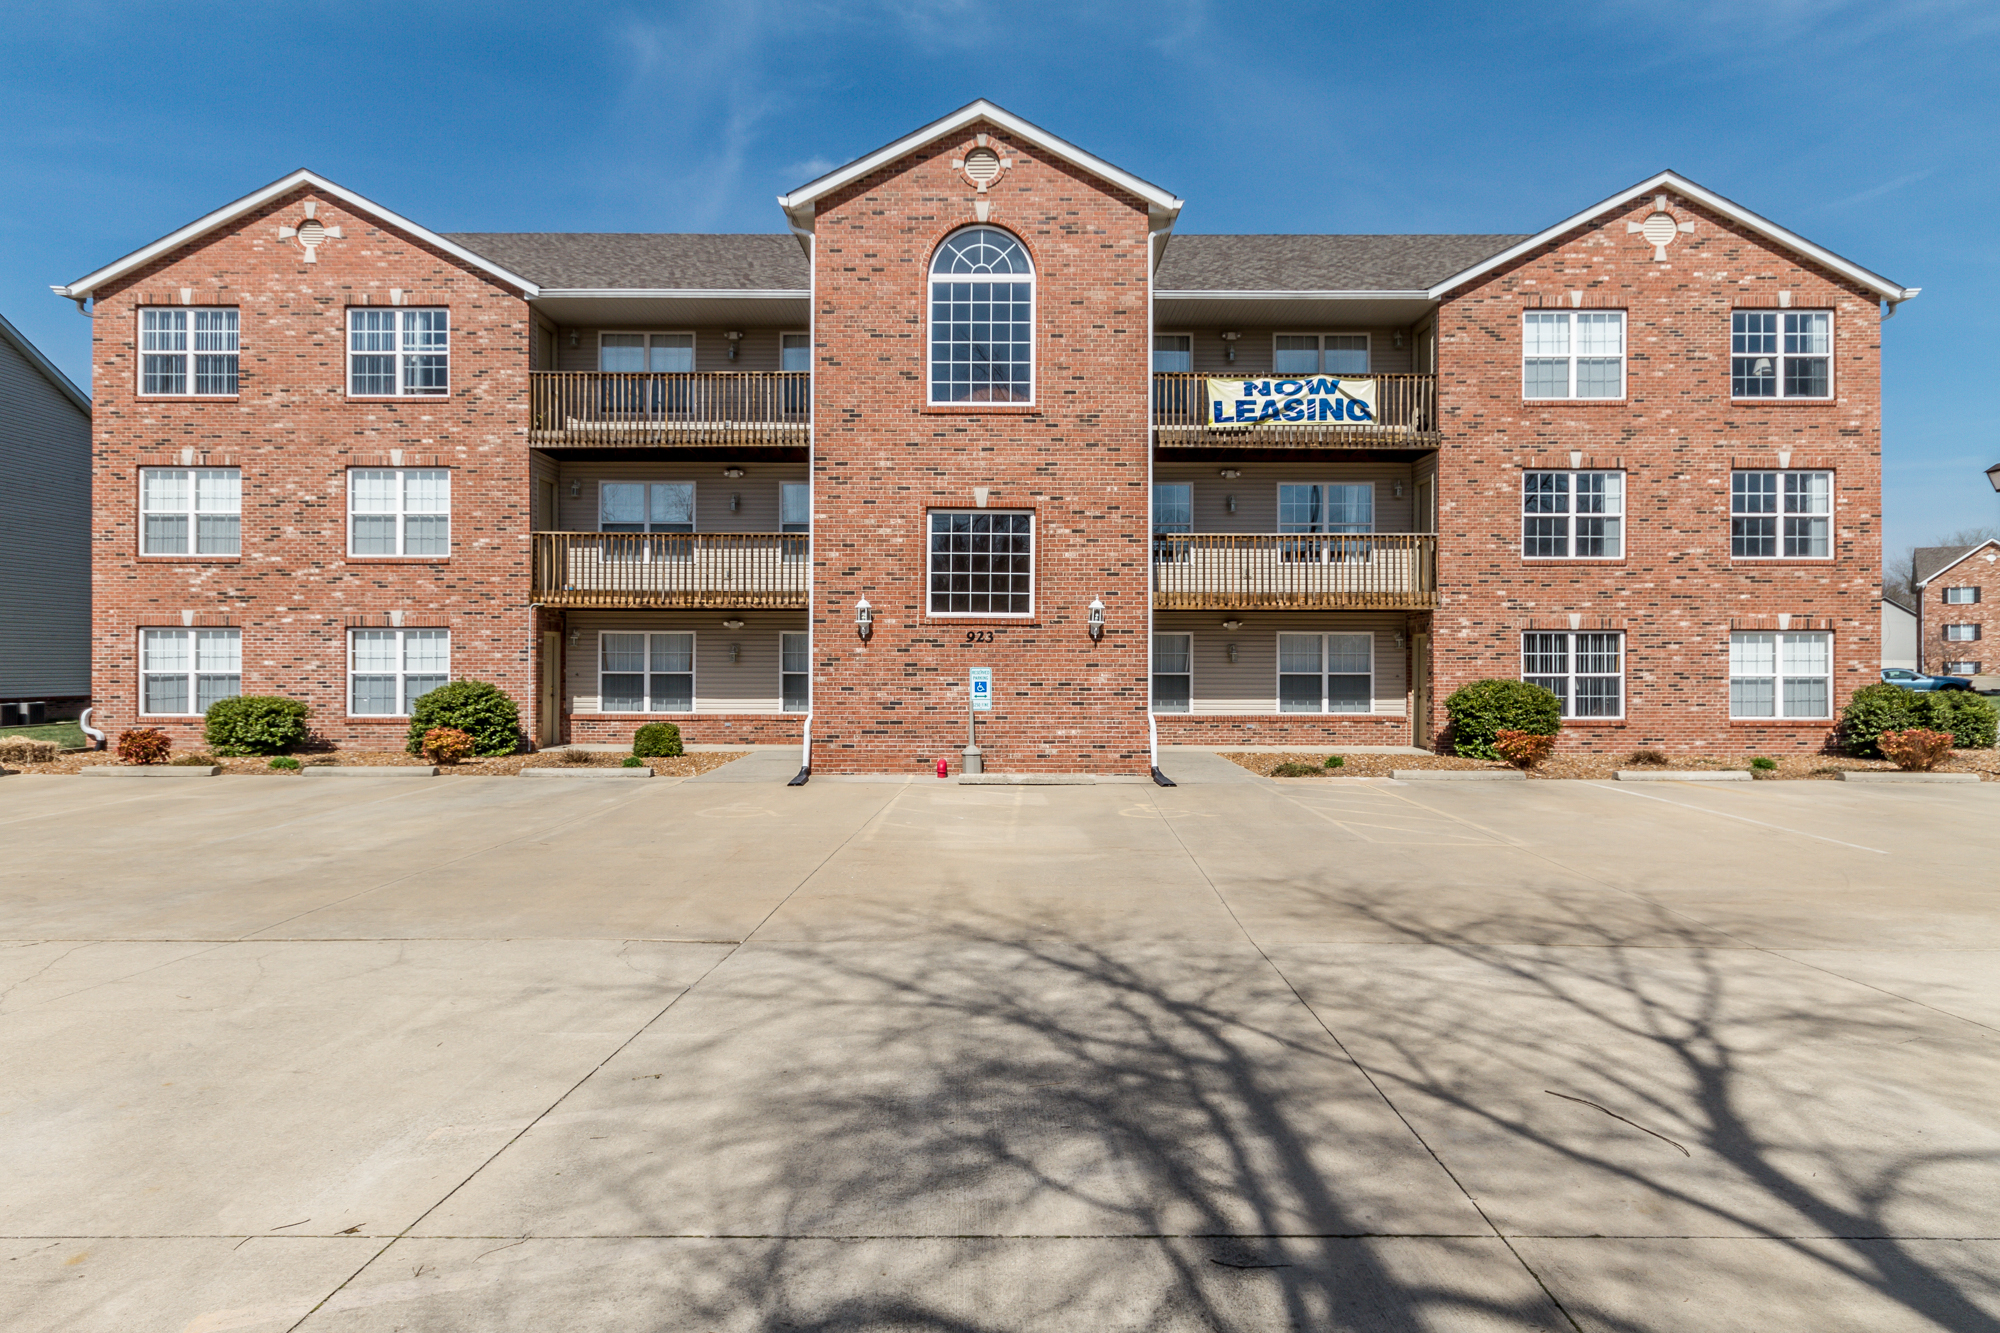 Brookside-Apartments-O'Fallon-Illinois-2.jpg